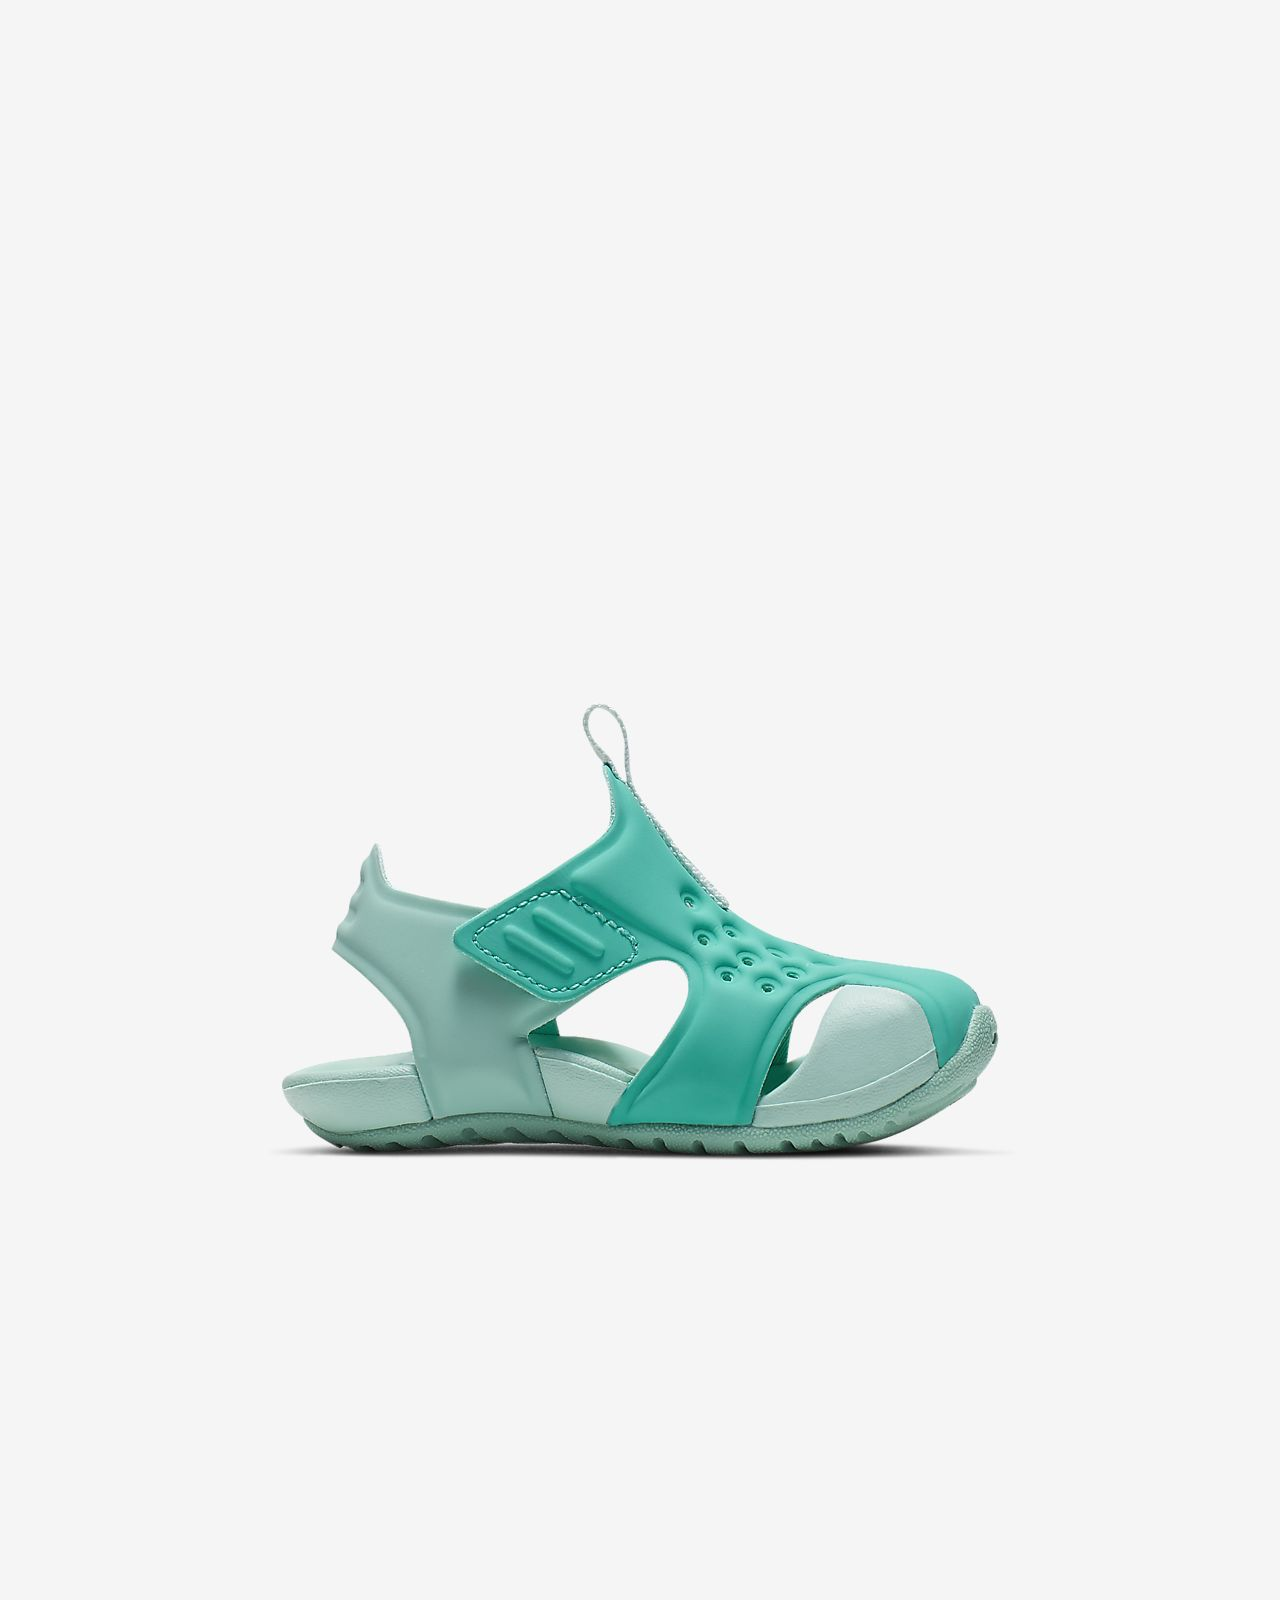 e553822b4b8 Σανδάλι Nike Sunray Protect 2 για βρέφη και νήπια. Nike.com GR